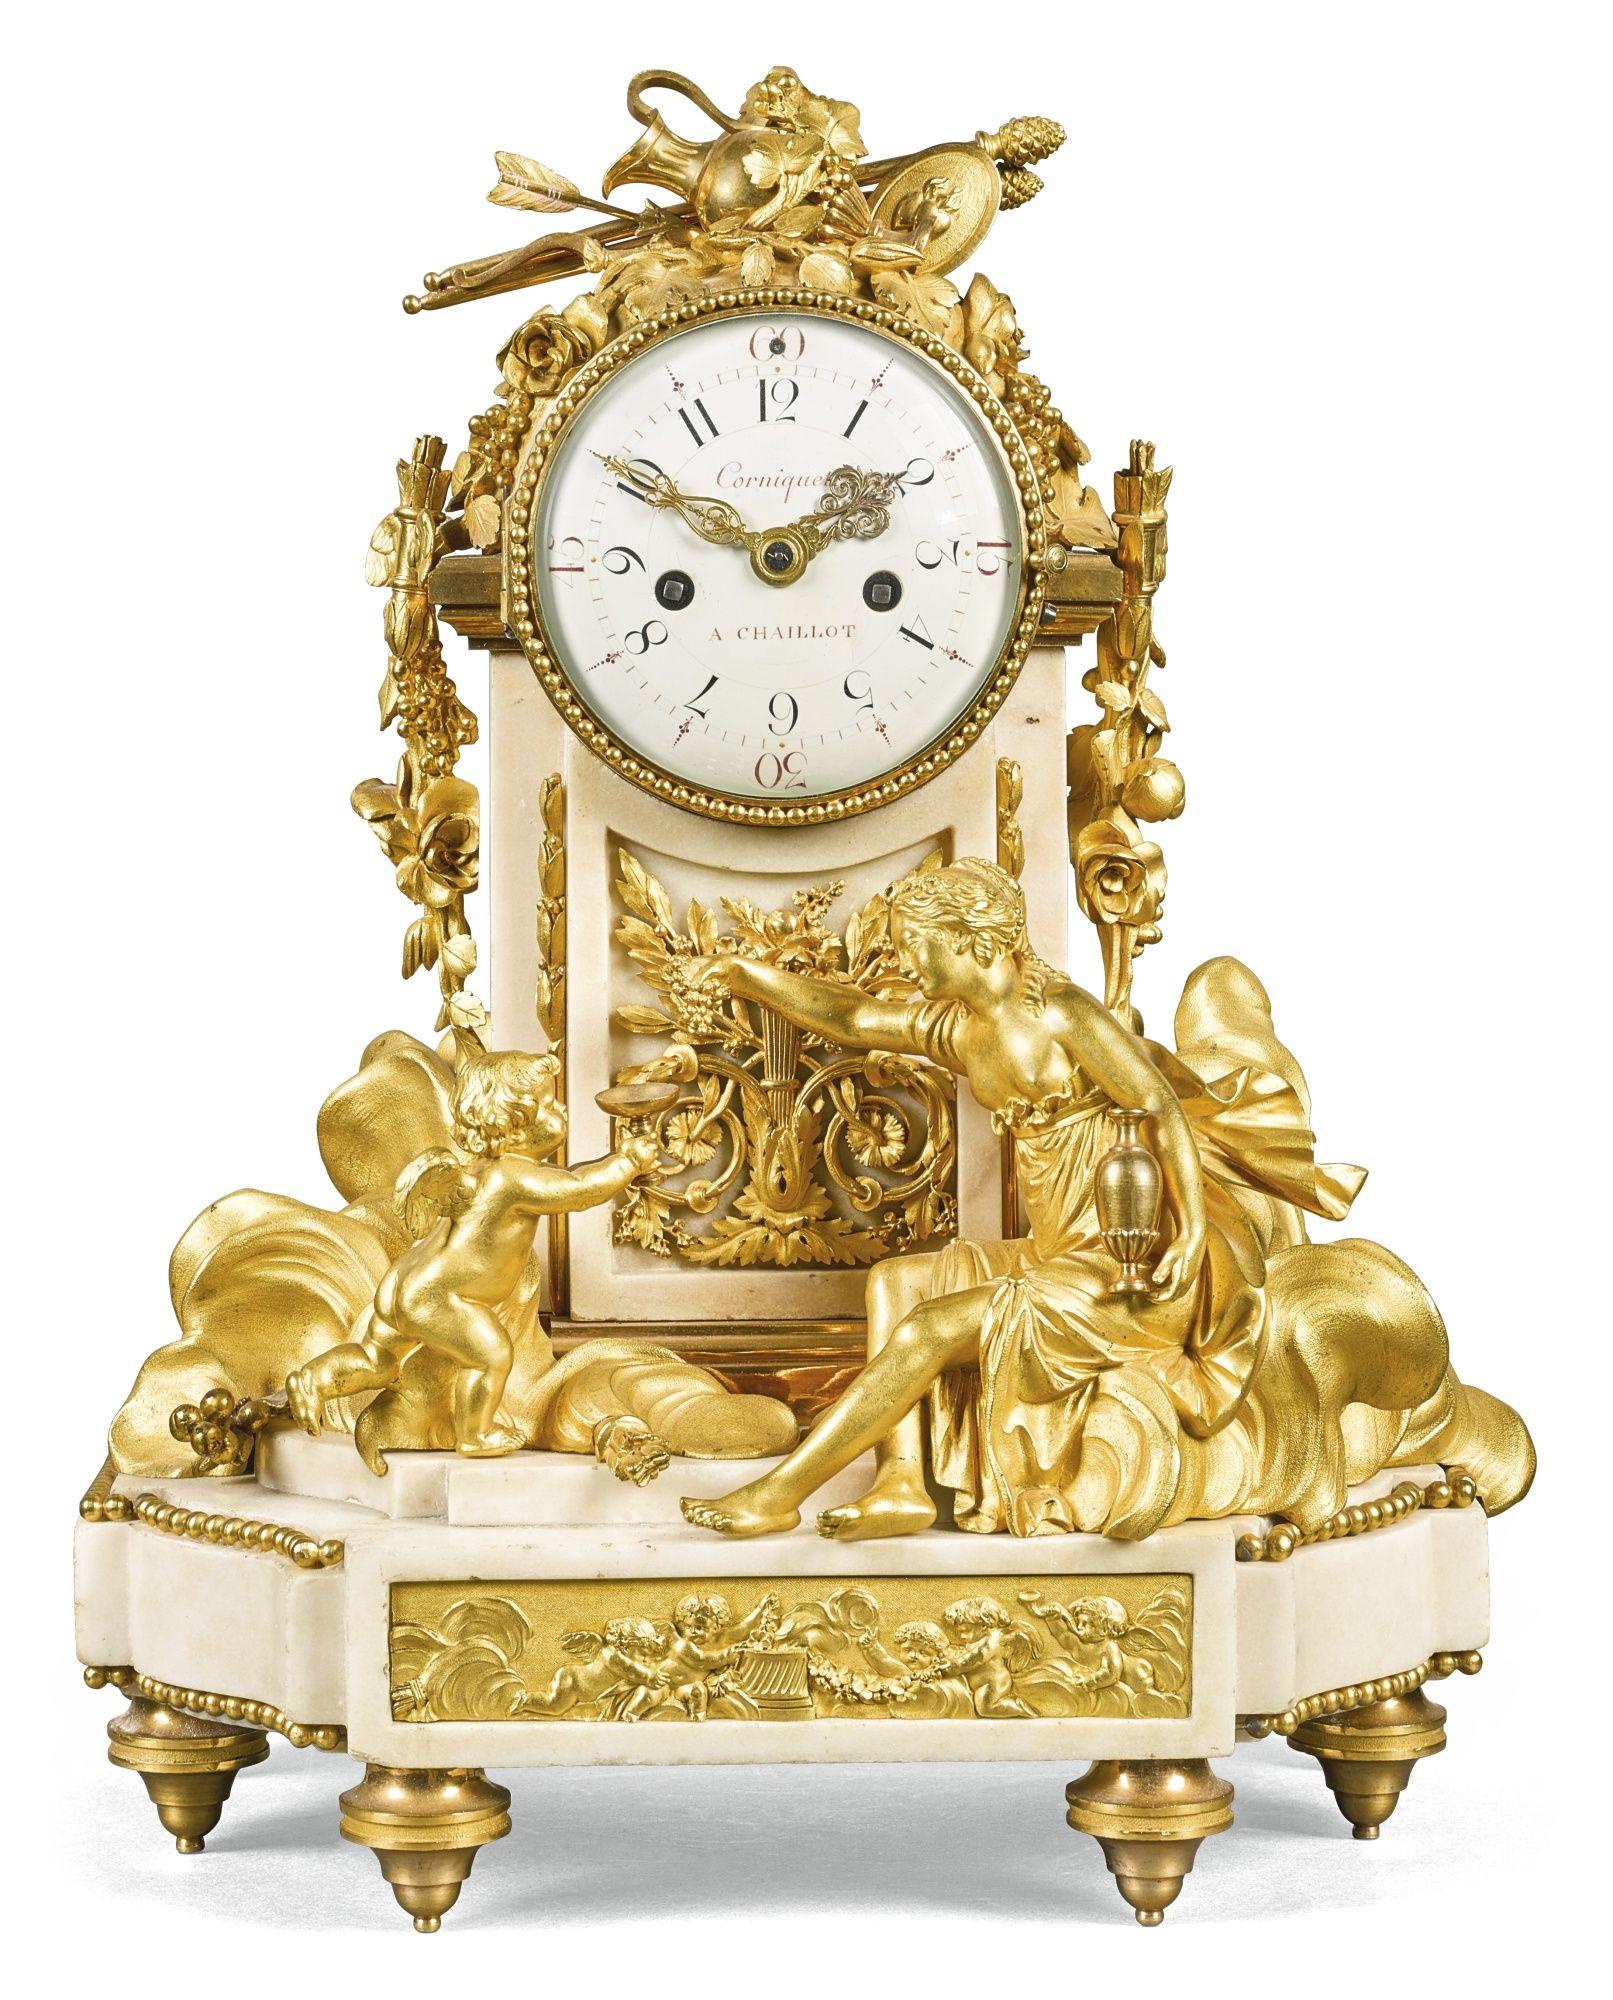 Louis Xvi Gilt Bronze And White Marble Mantel Clock Philippe Jacques Corniquet Paris Circa 1790 Antique Wall Clocks Antique Clocks Mantel Clock